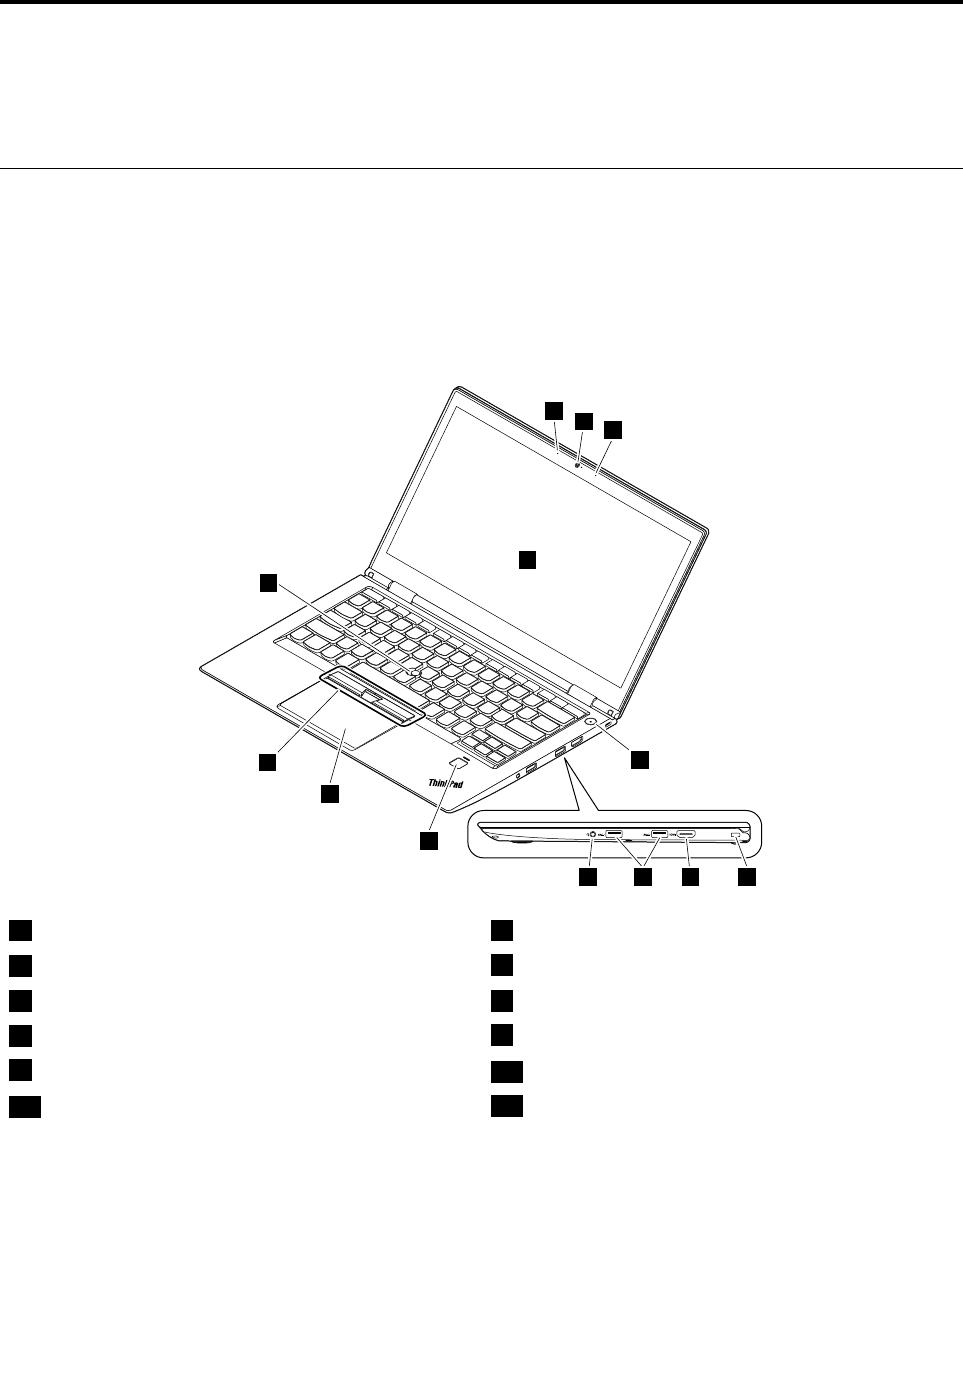 Lenovo X1Carbon Mt20Fb 20Fc X1Yoga Hmm Jp Sp40J72016 02 Ja